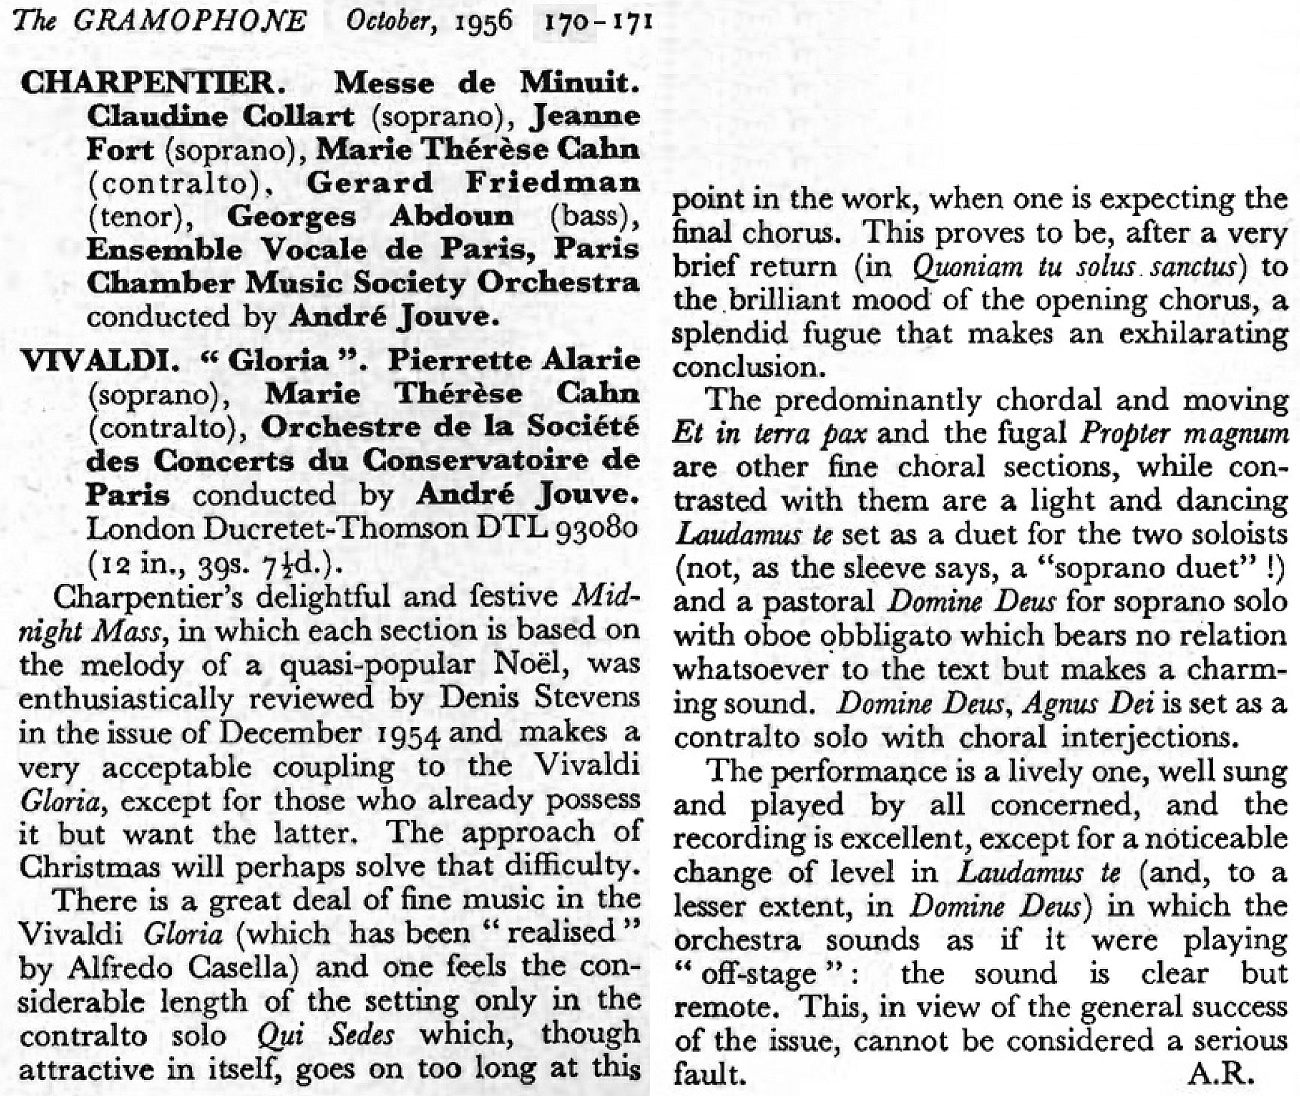 Vivaldi Gloria Jouve The Gramophone october 1956 page 170 171 Extrait